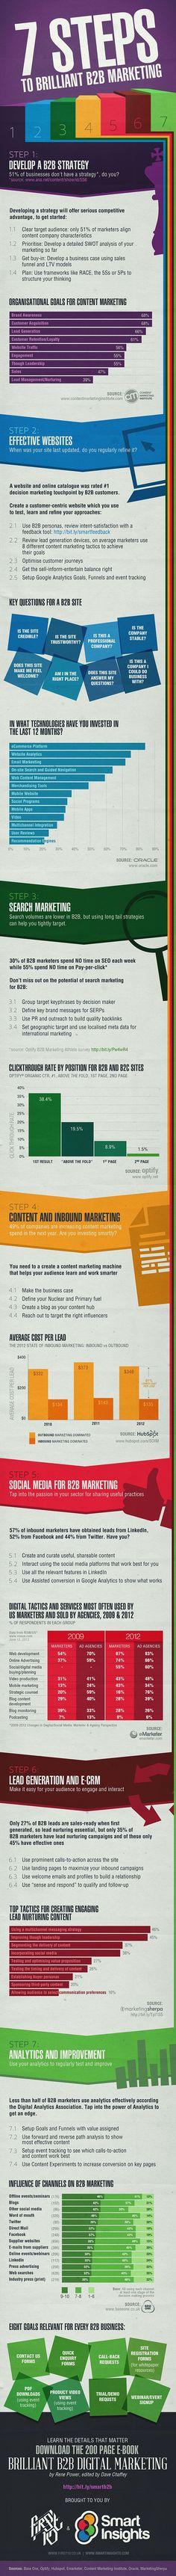 7 Steps To Brilliant B2B Marketing